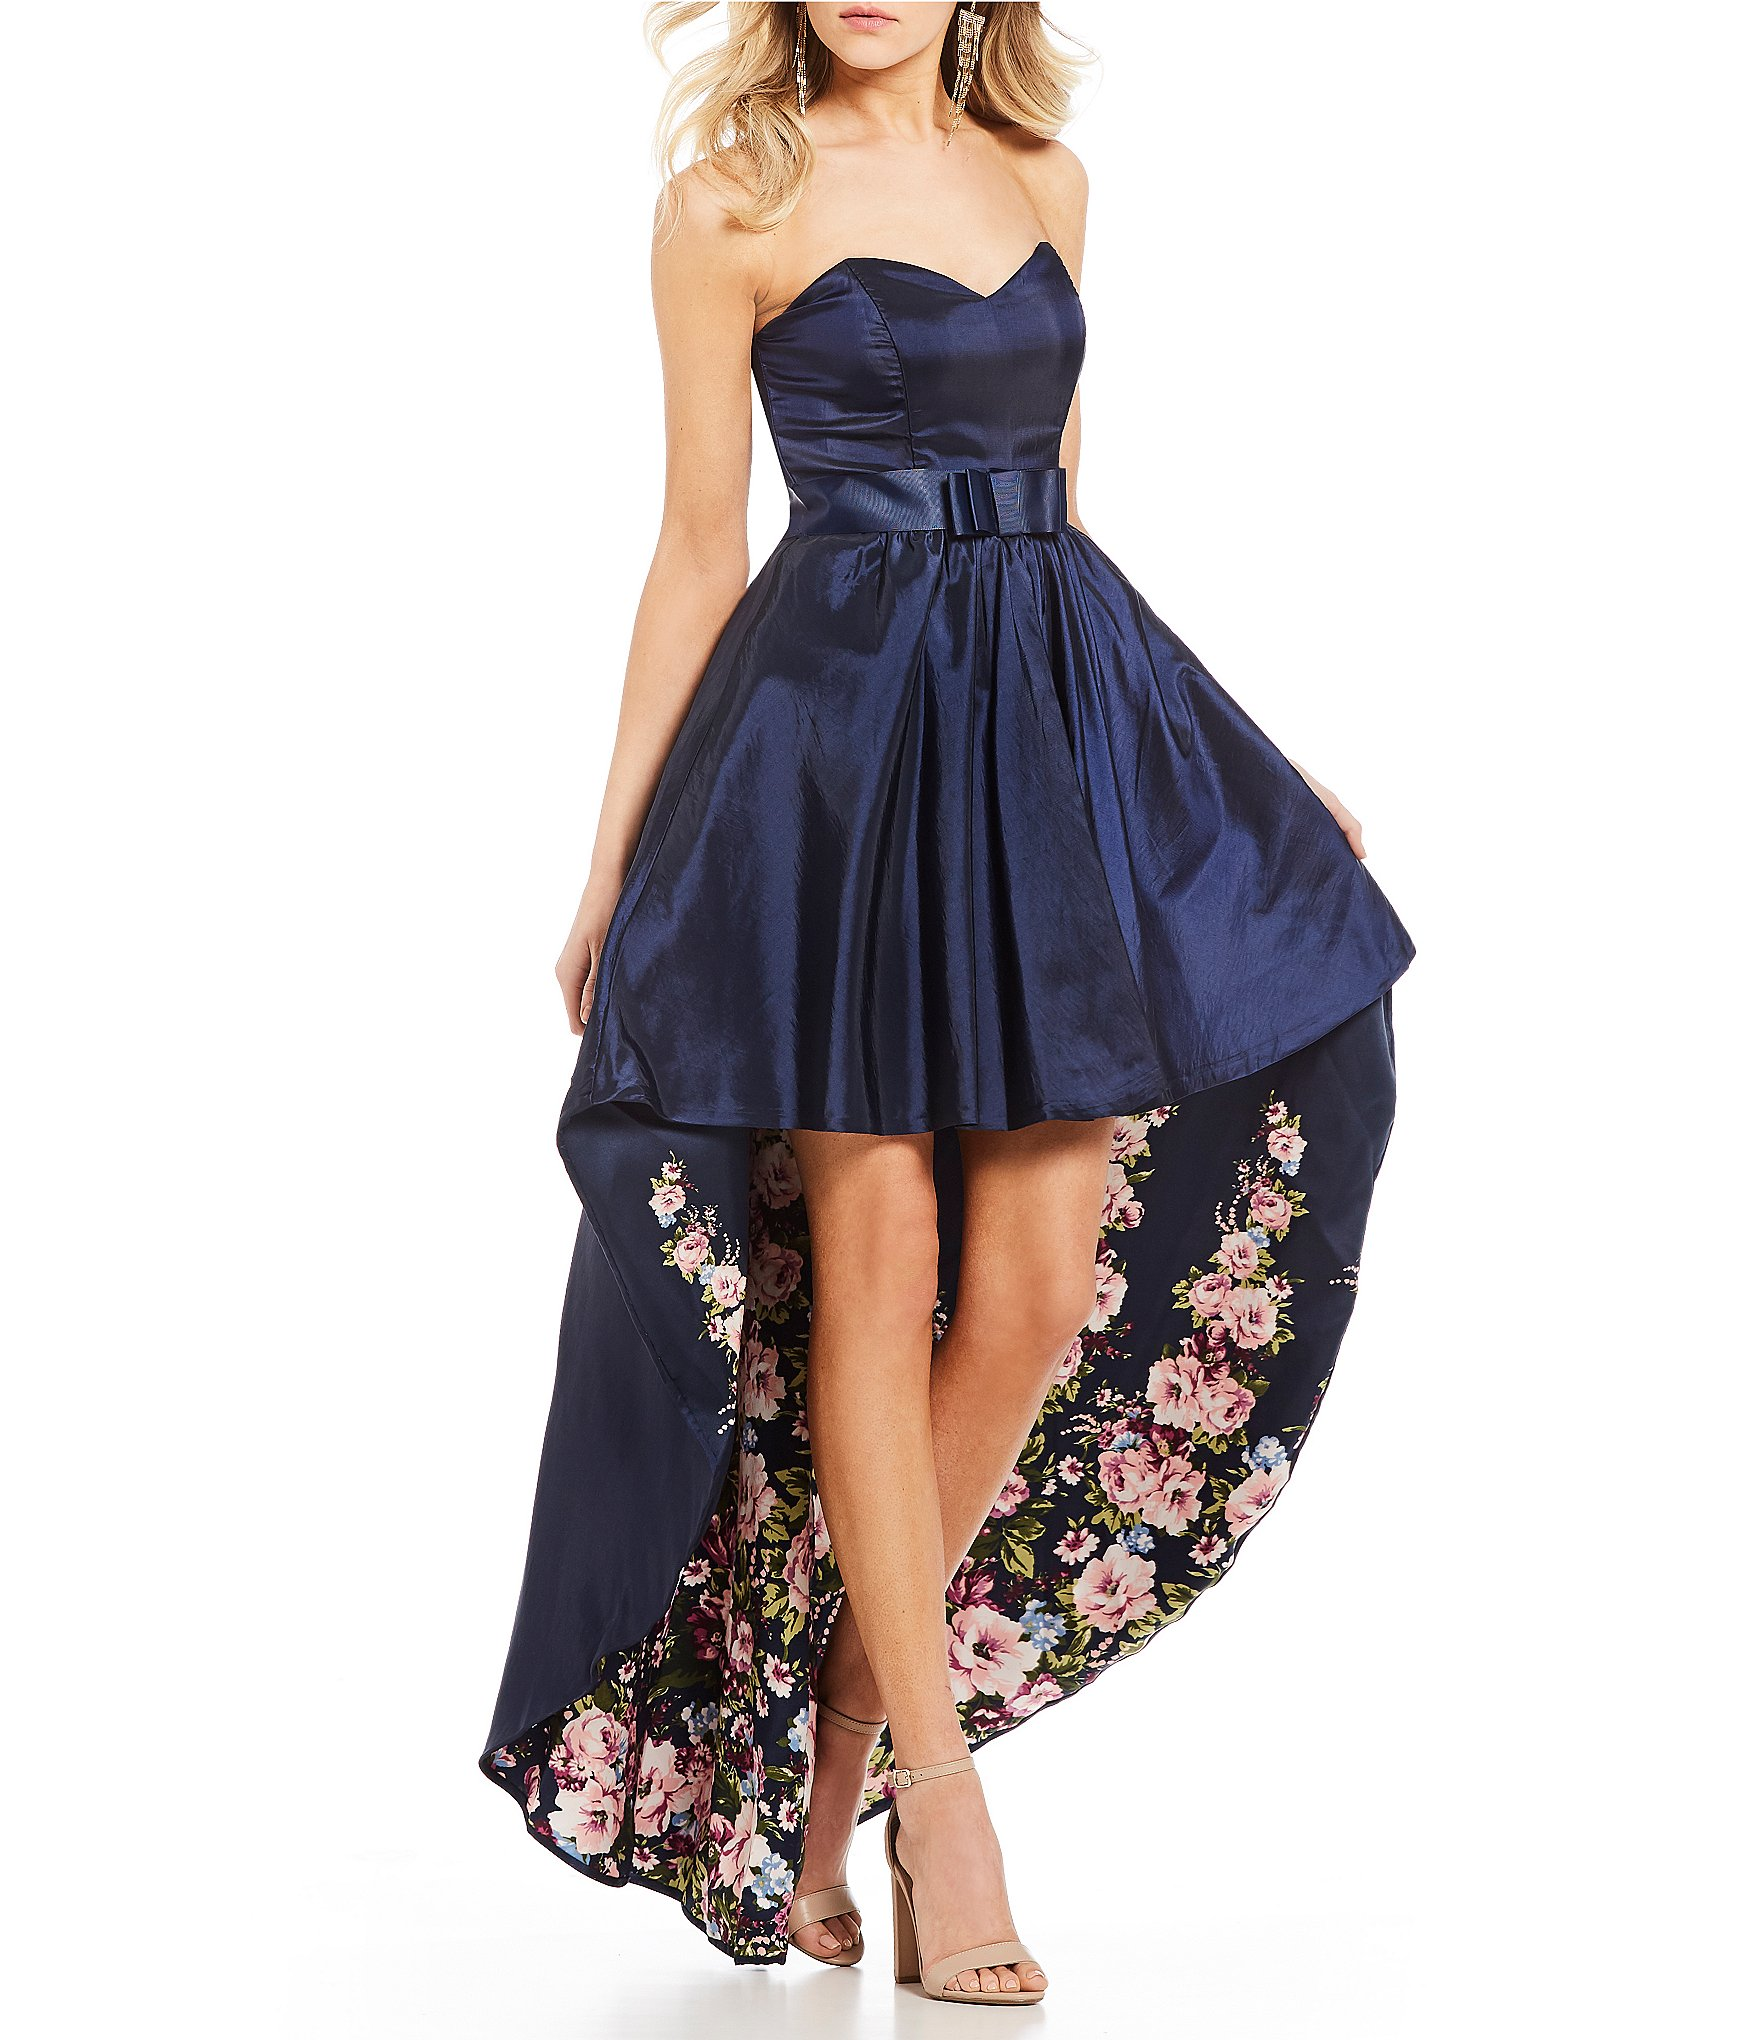 Cocktail Dresses at Dillard's